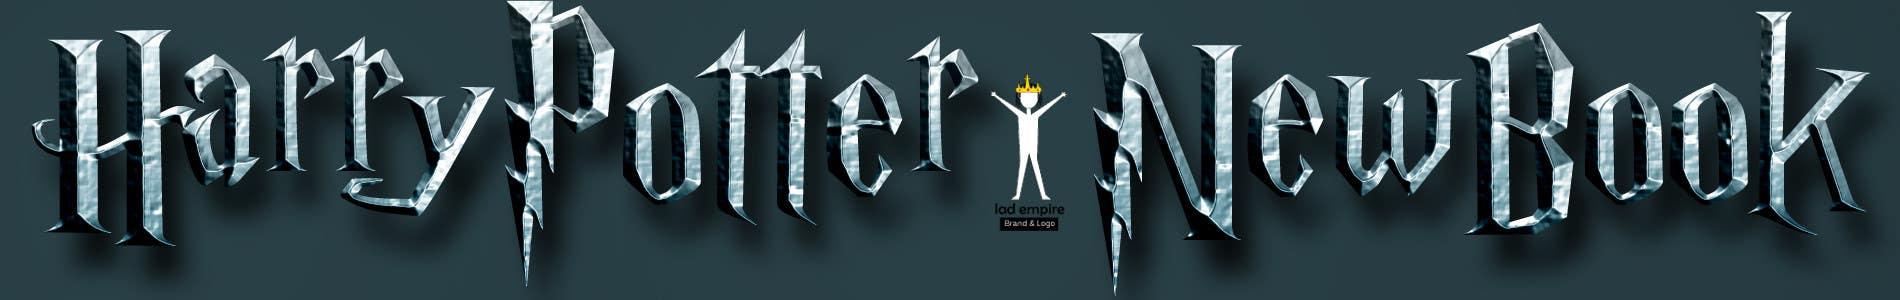 Penyertaan Peraduan #                                        2                                      untuk                                         Design a Logo for website (Harry Potter)